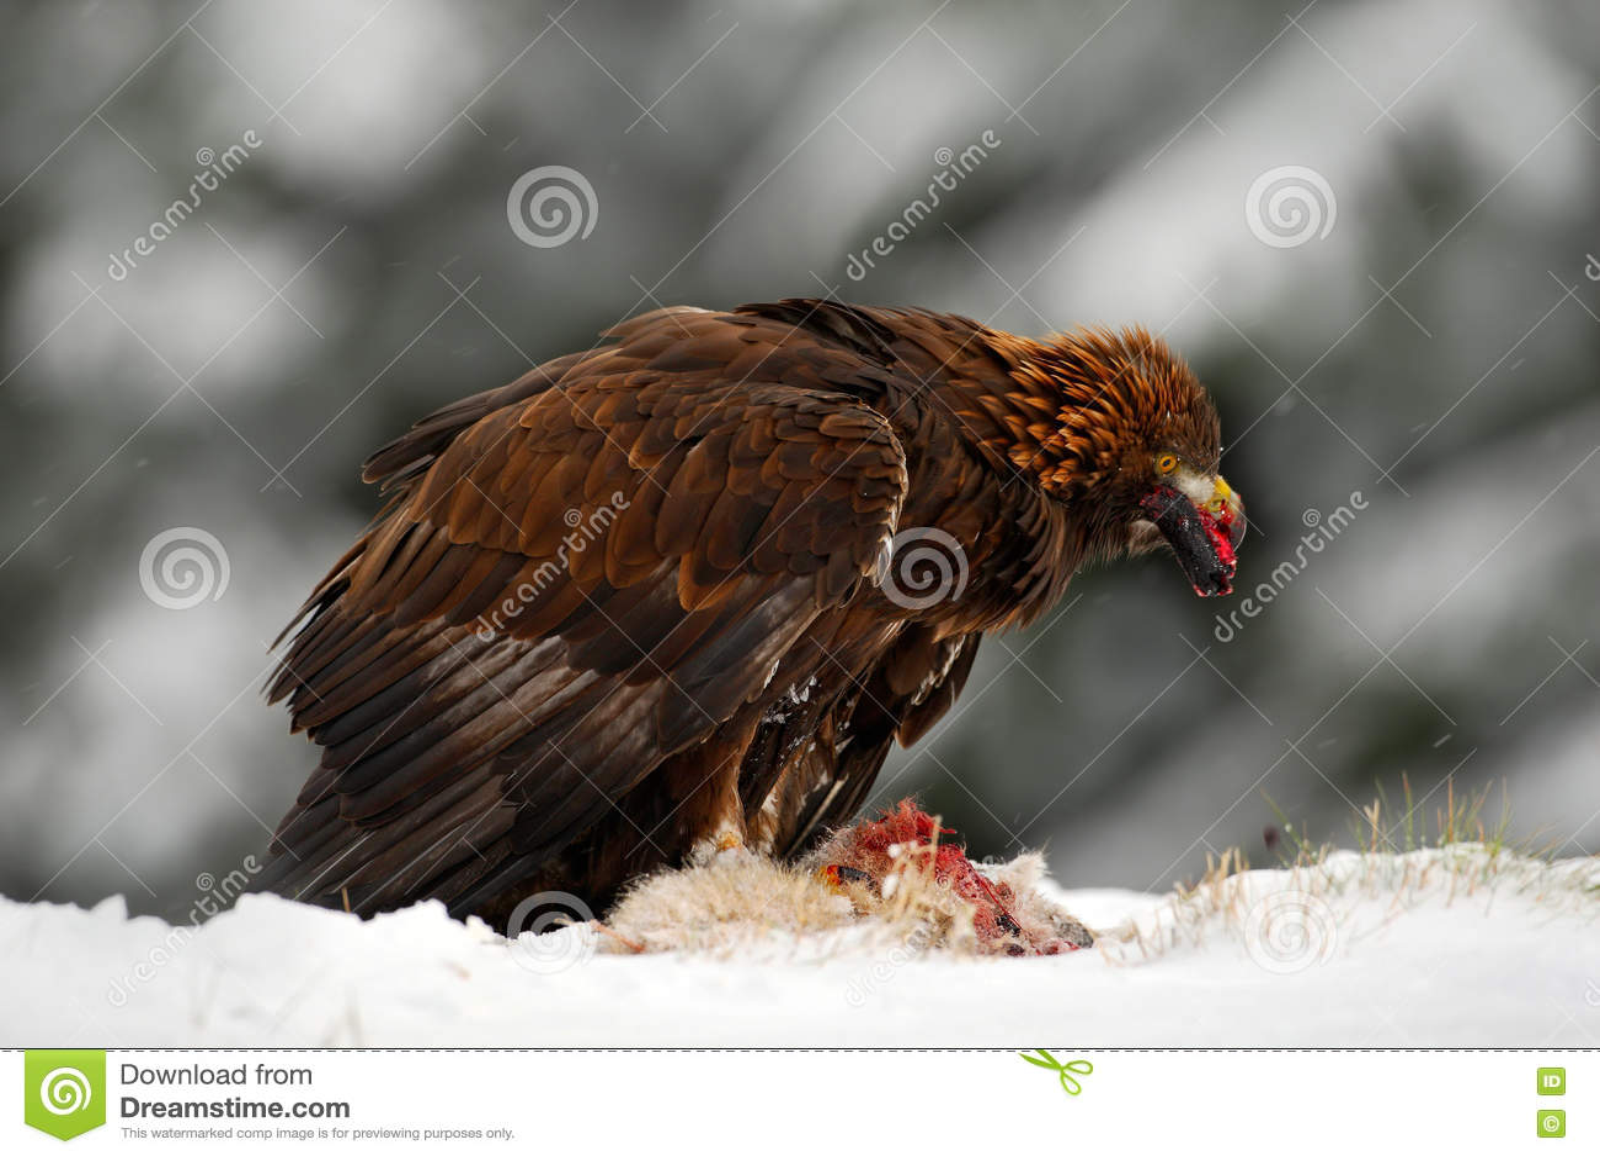 wildlife feeding scene from the nature golden eagle bird of prey